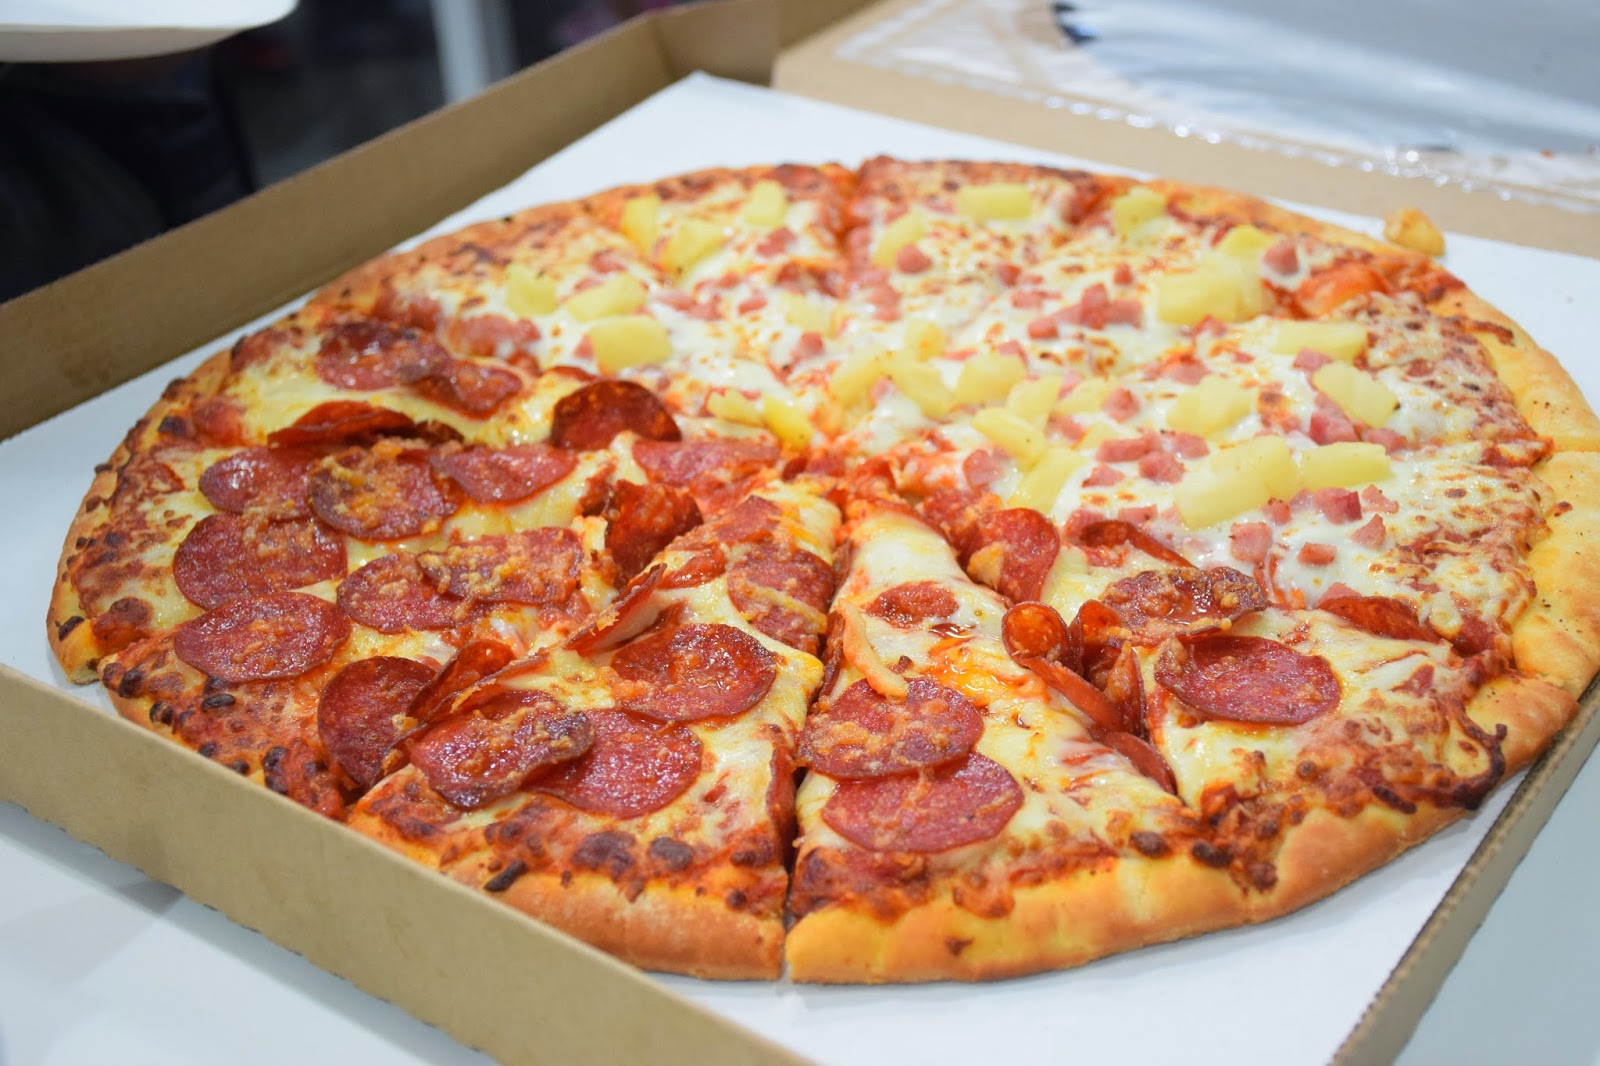 【costco·pizza】costco pizza – TouPeenSeen部落格